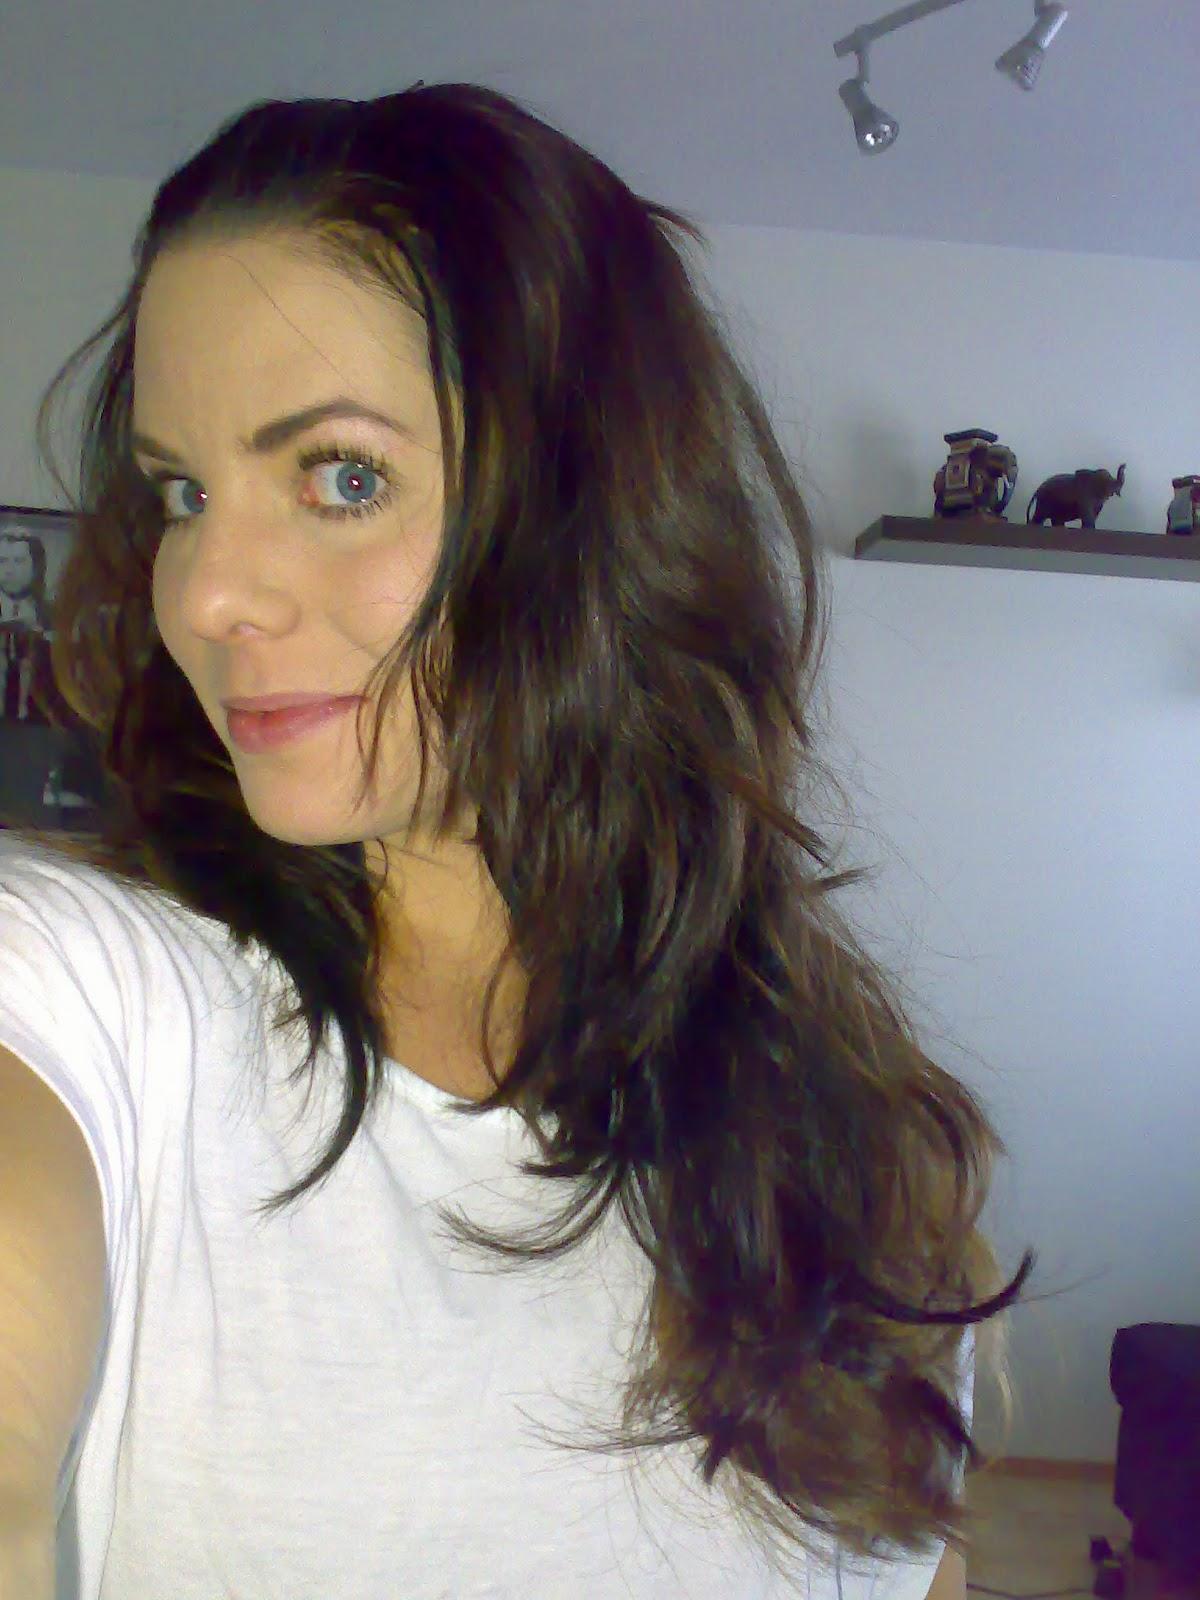 horoskoopi punaiset hiukset blogi